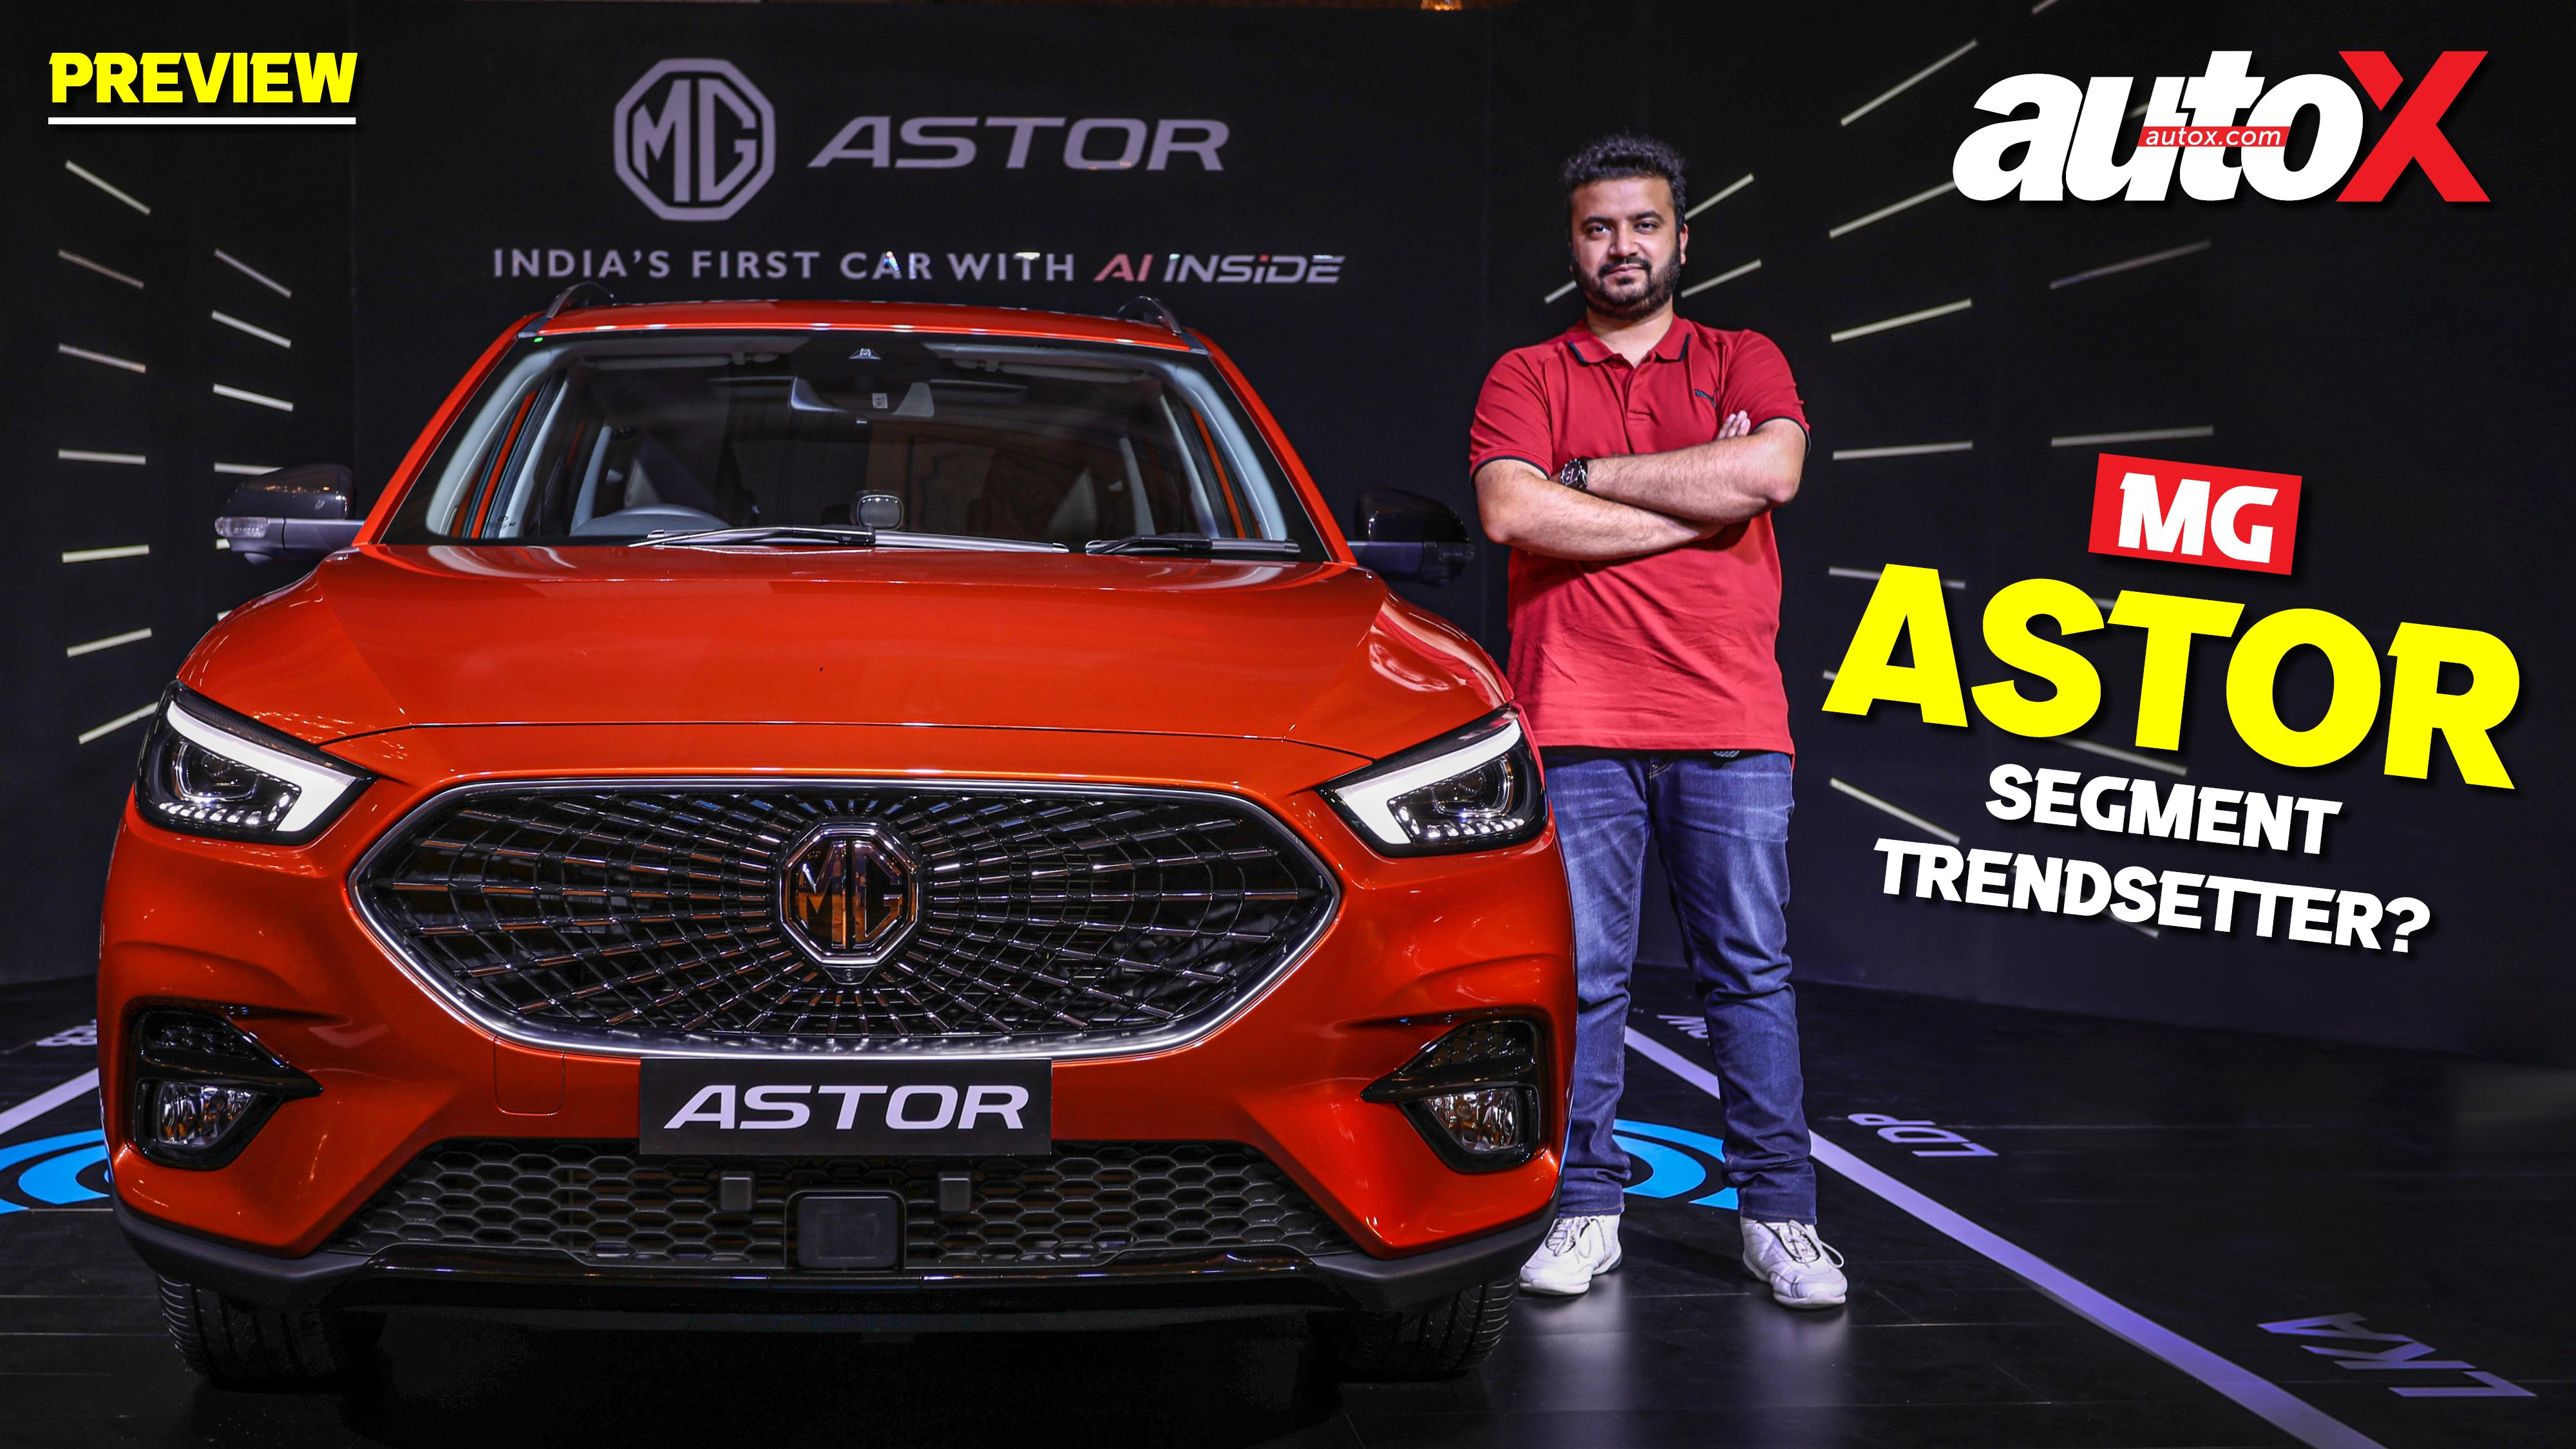 MG Astor: Better SUV than the Hyundai Creta & Kia Seltos? | Preview | autoX